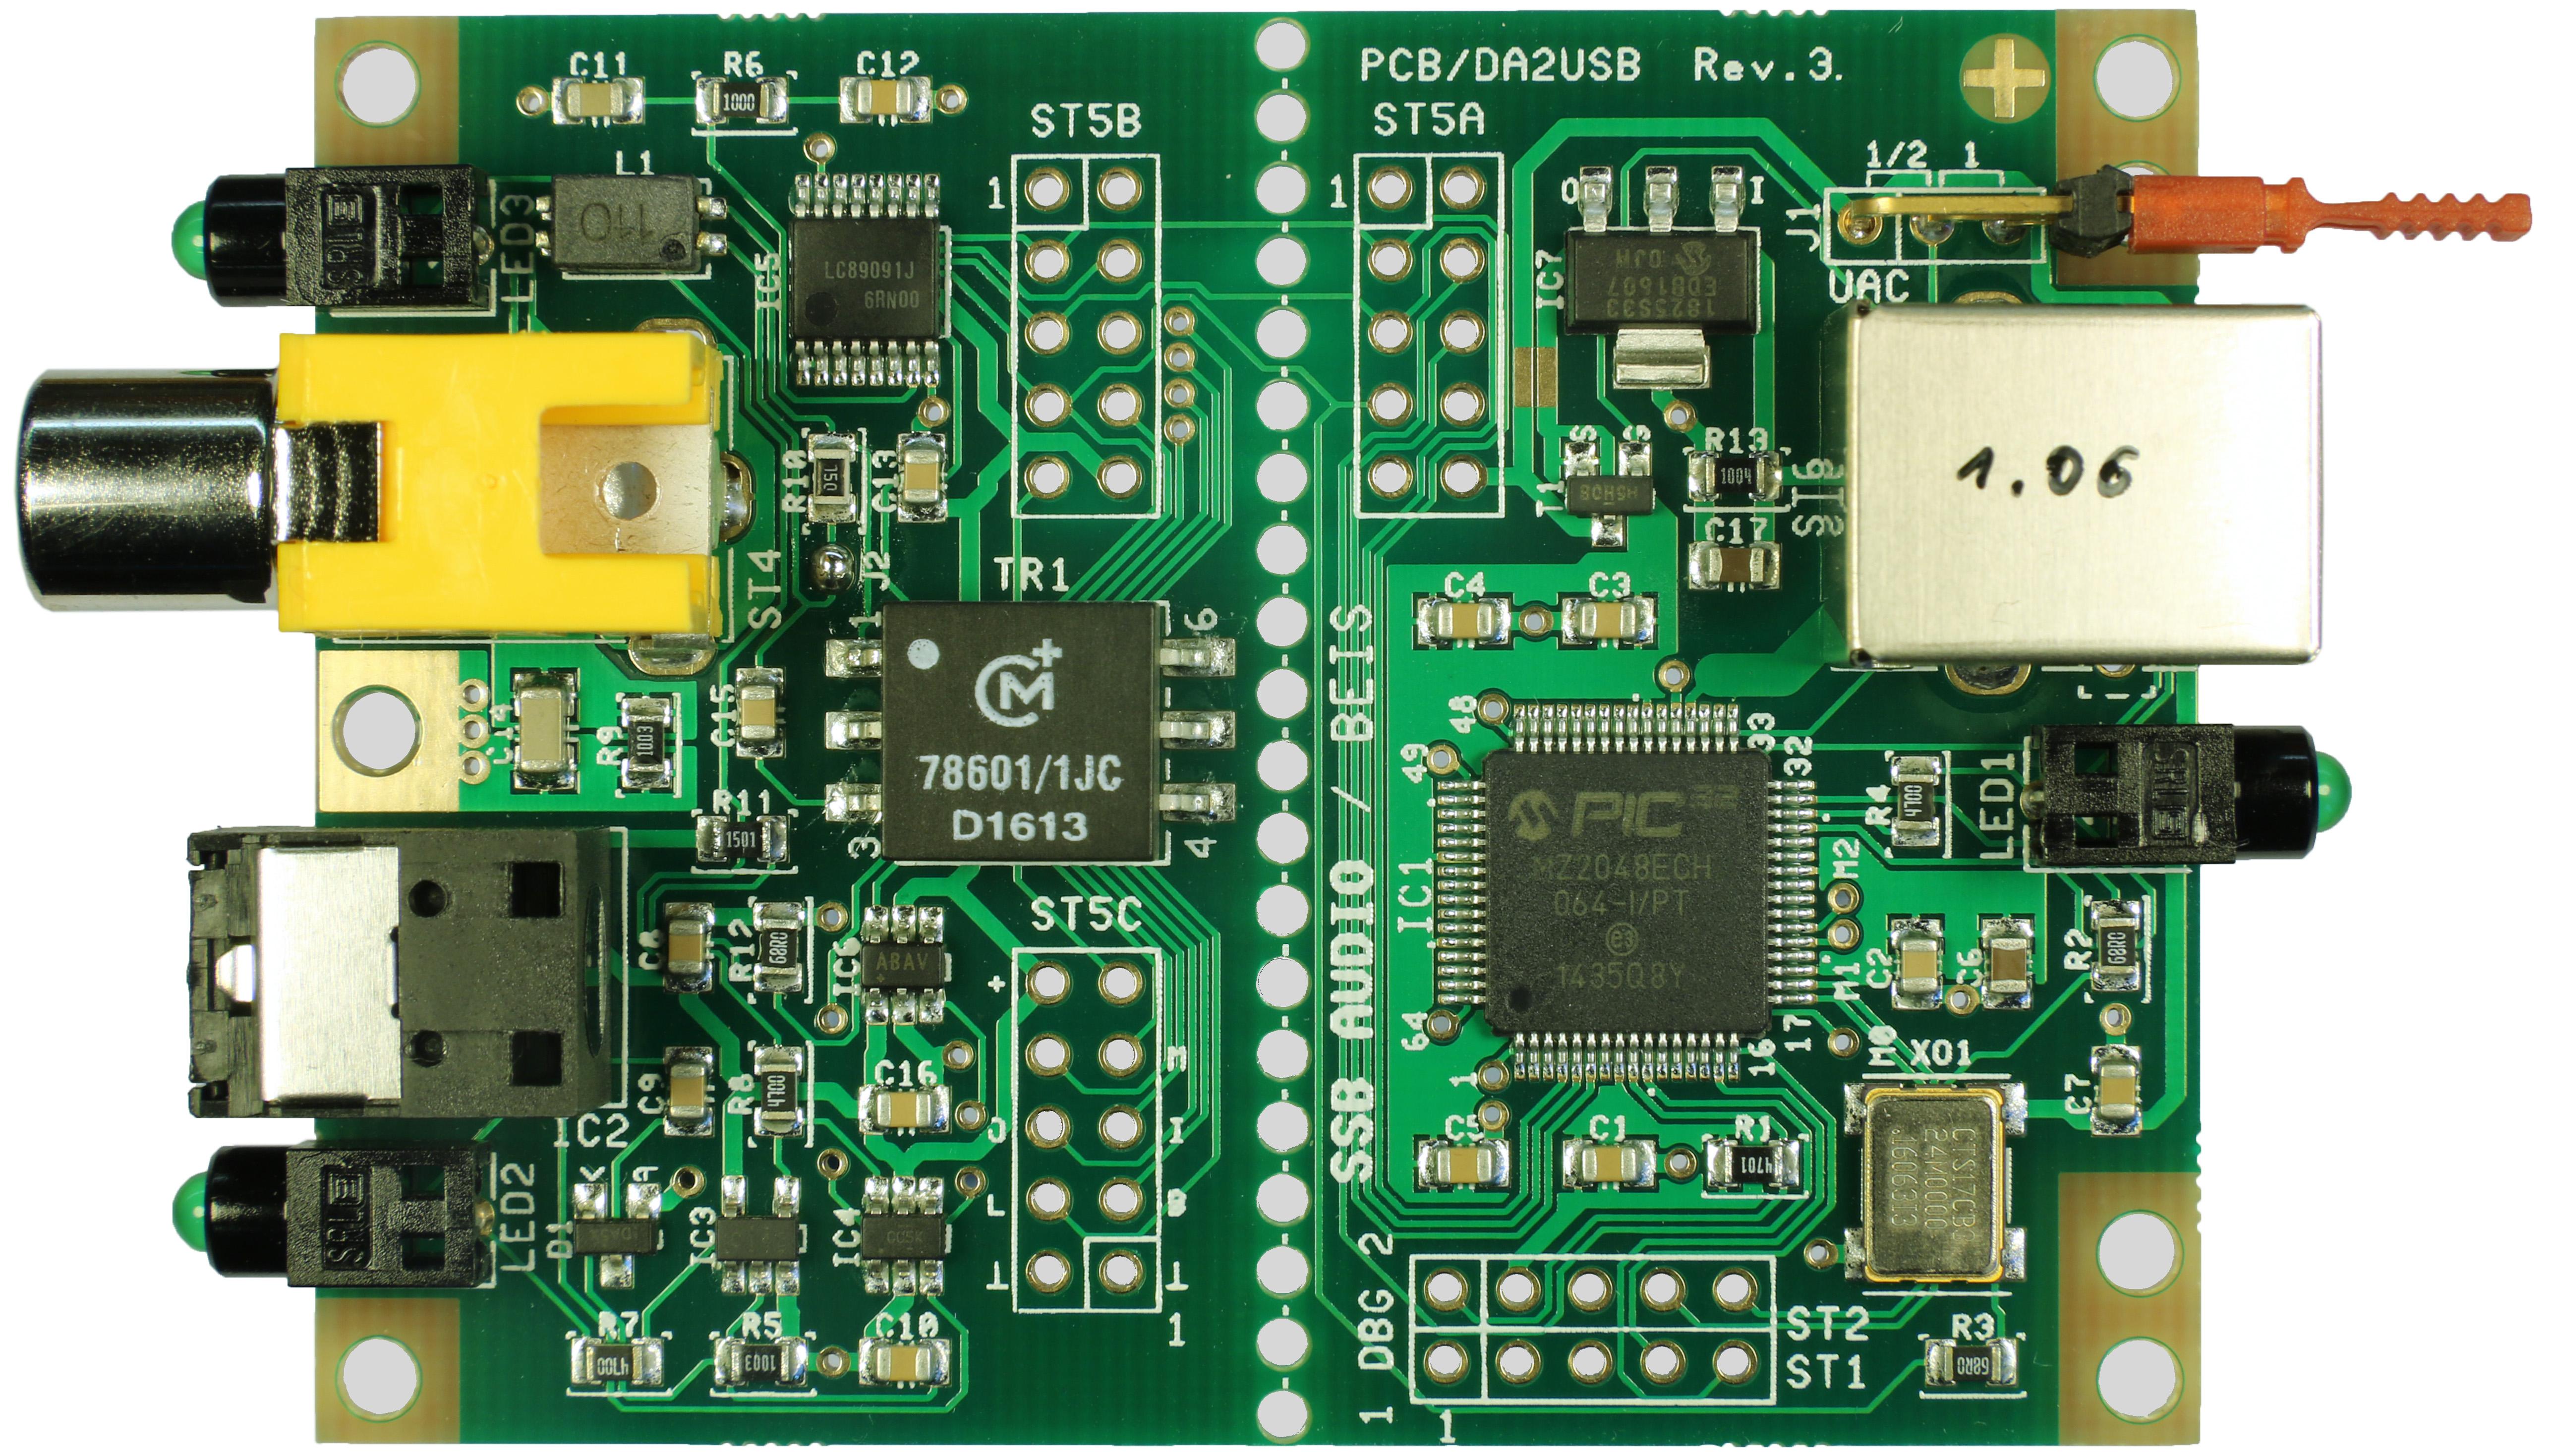 XLR Output USB to AES3 Converter